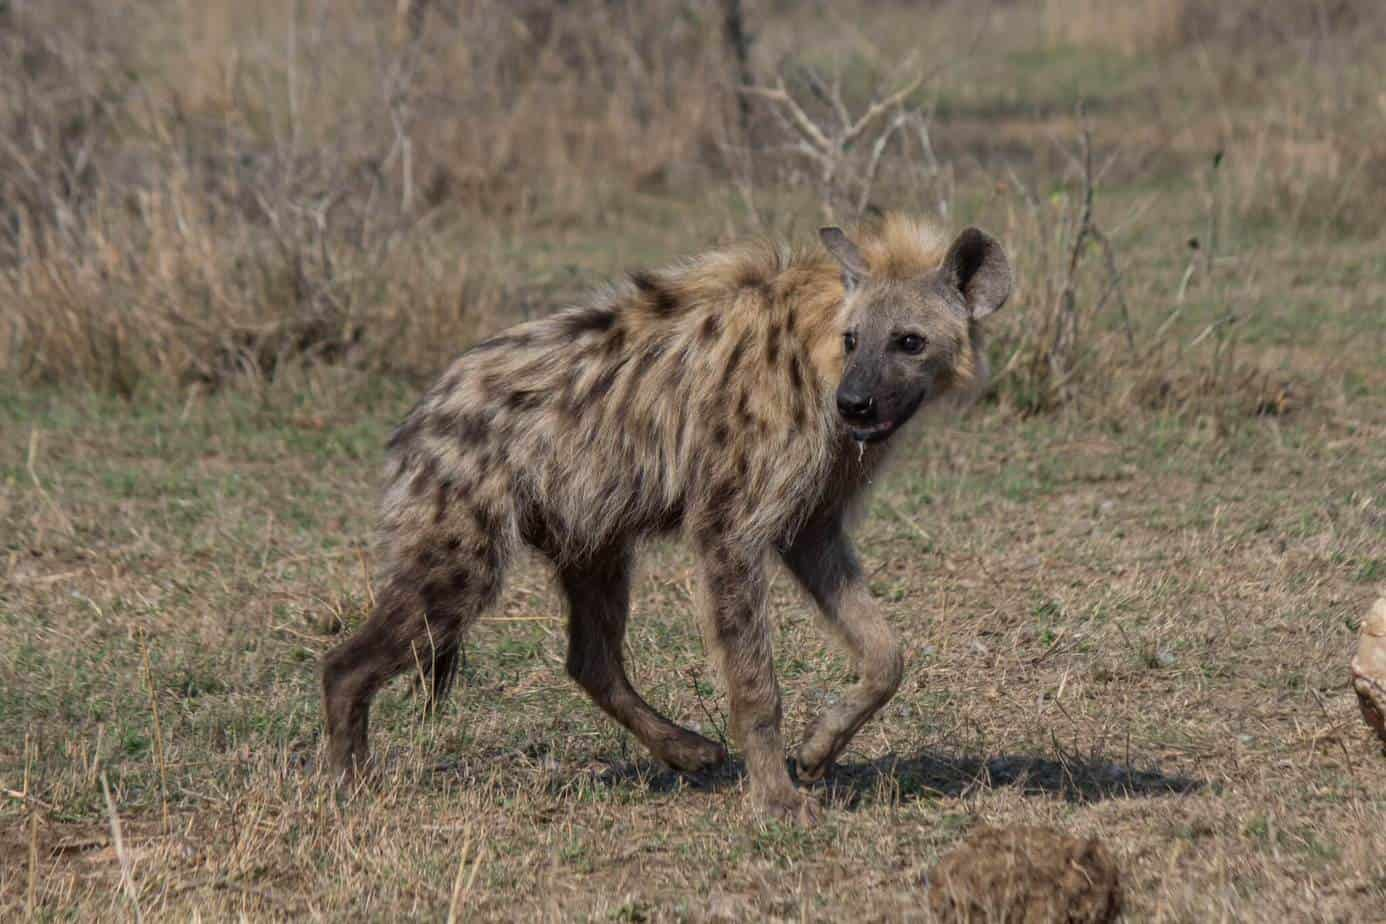 Spotted Hyena @ Hluhluwe-iMfolozi Park. Photo: Håvard Rosenlund